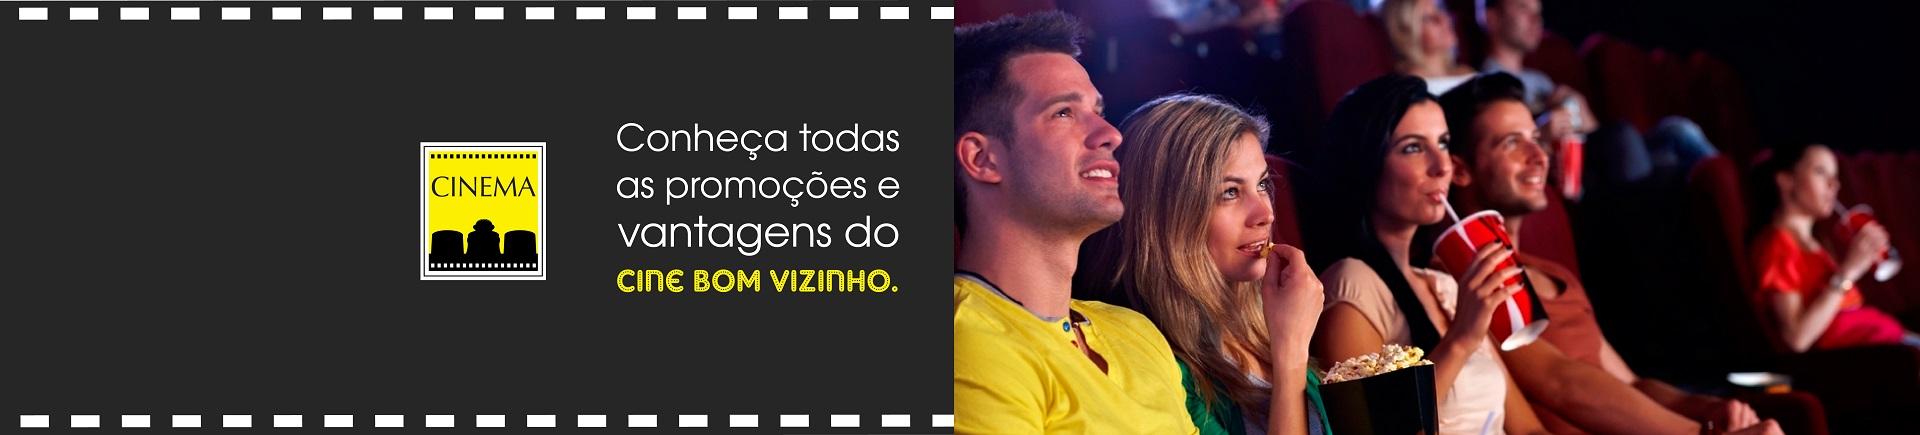 04 - Cine Bom Vizinho